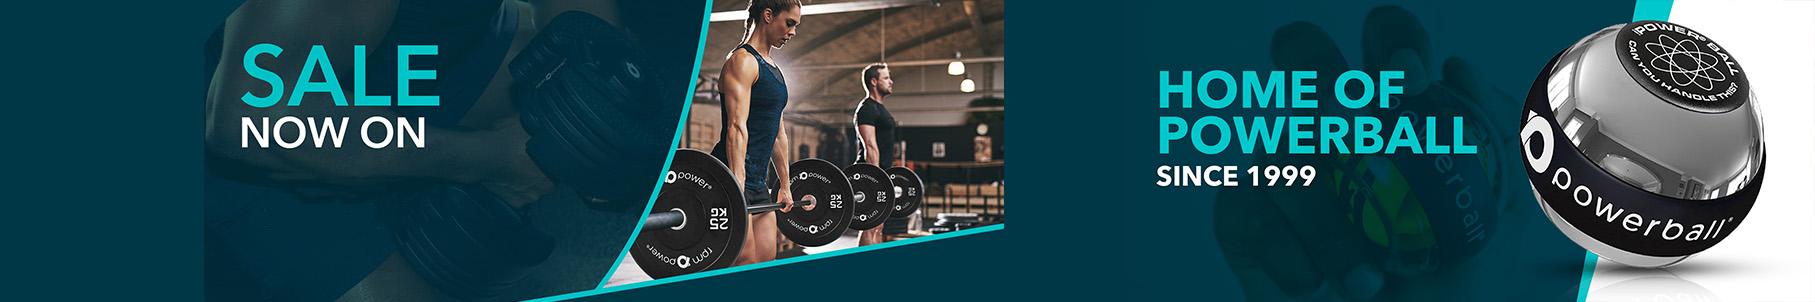 fitness sale items, adjustable dumbbells, weights sets